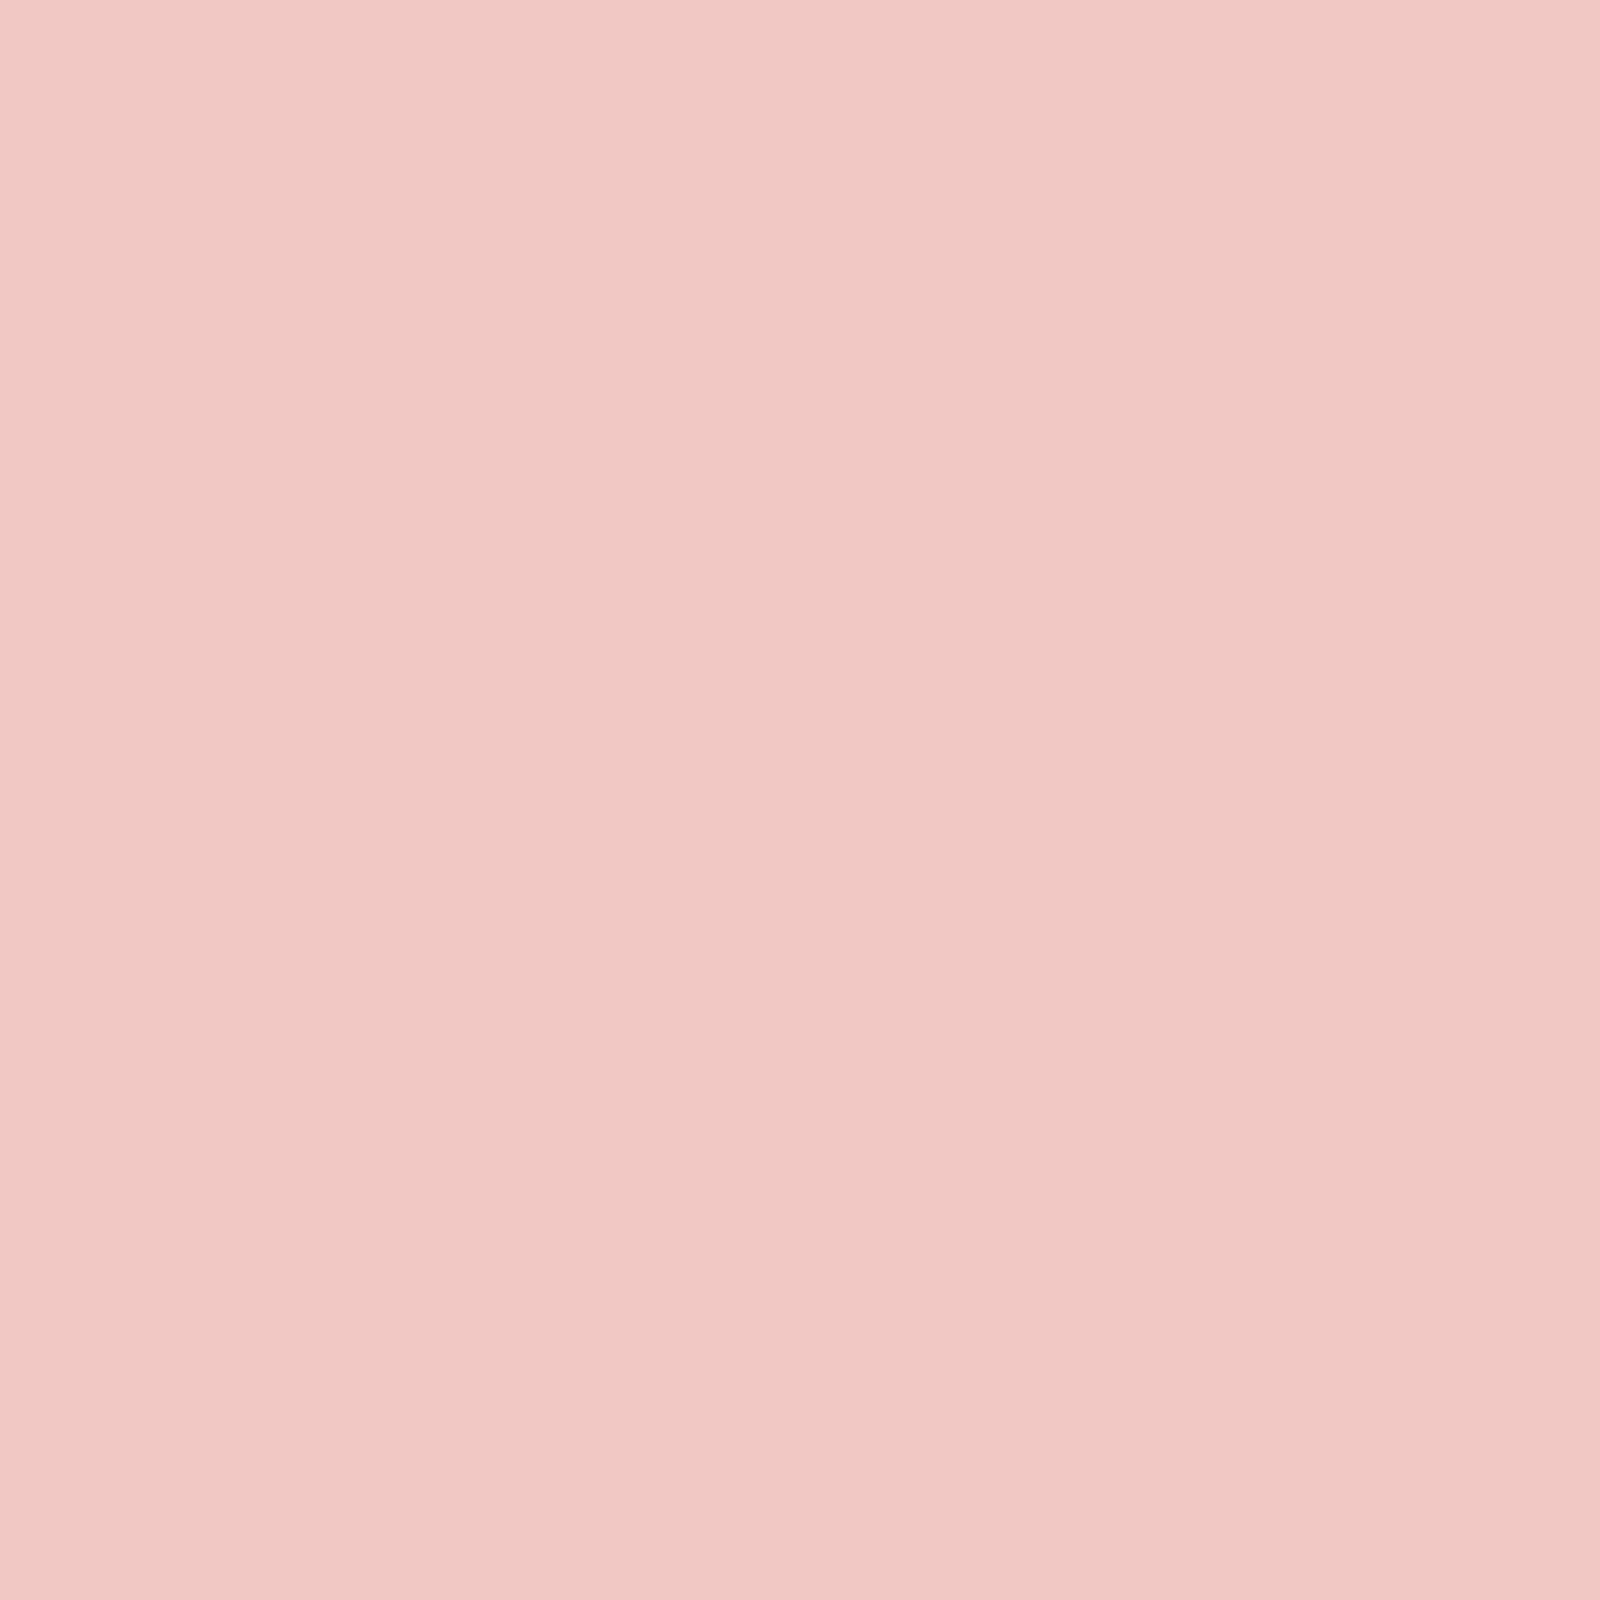 Flannel Solid - Powder Pink<br/>Maywood Studio F100-P2